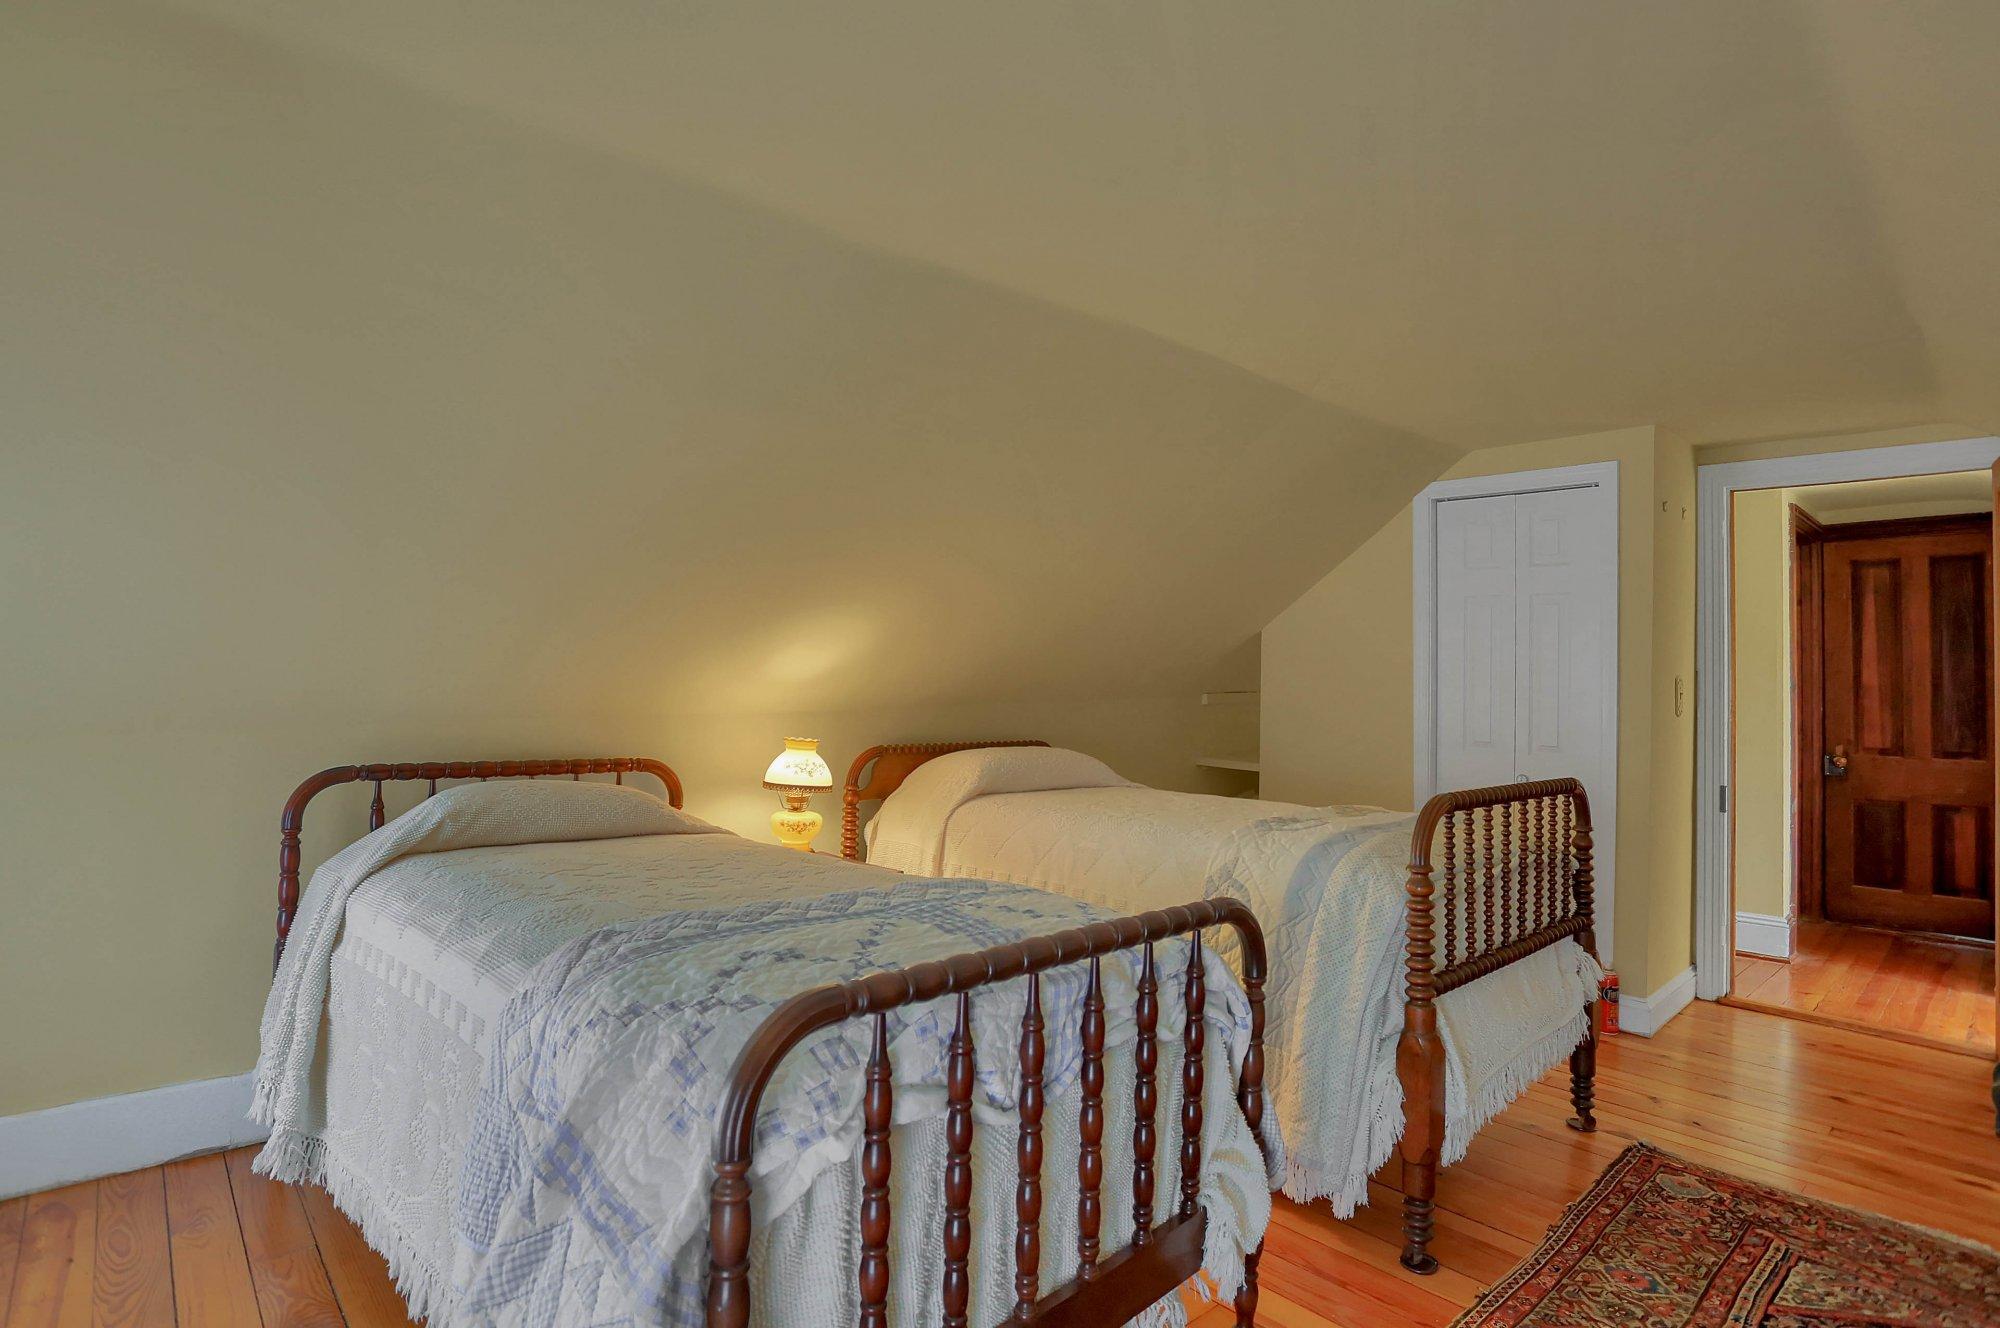 Thurber's Garret 3rd floor guest room